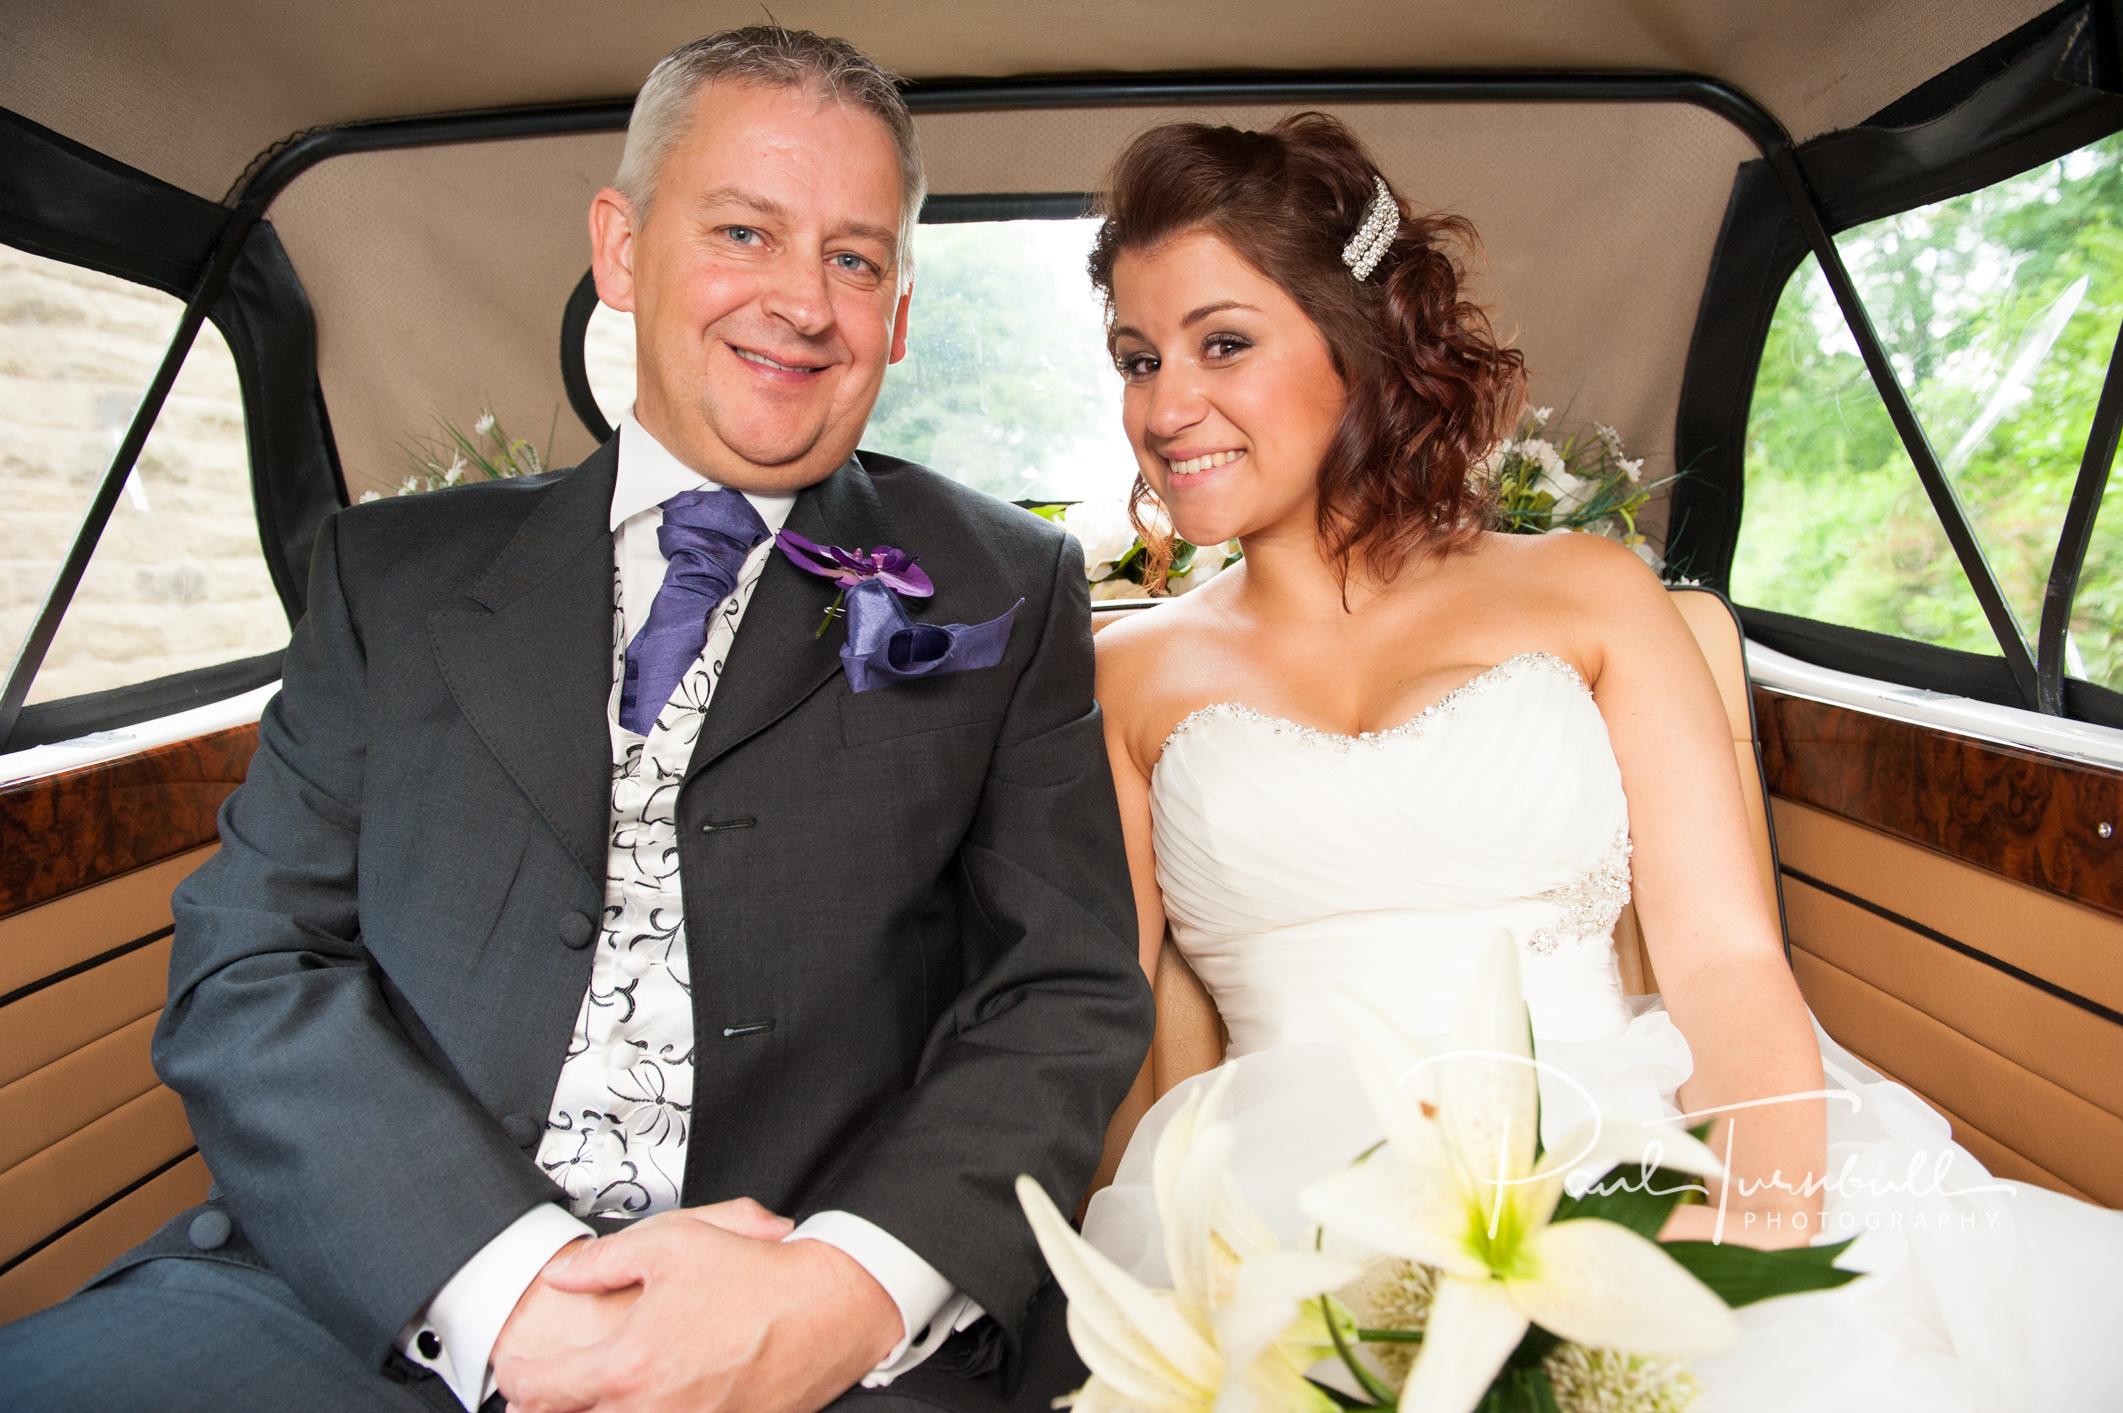 wedding-photography-healds-hall-liversedge-yorkshire-036.jpg